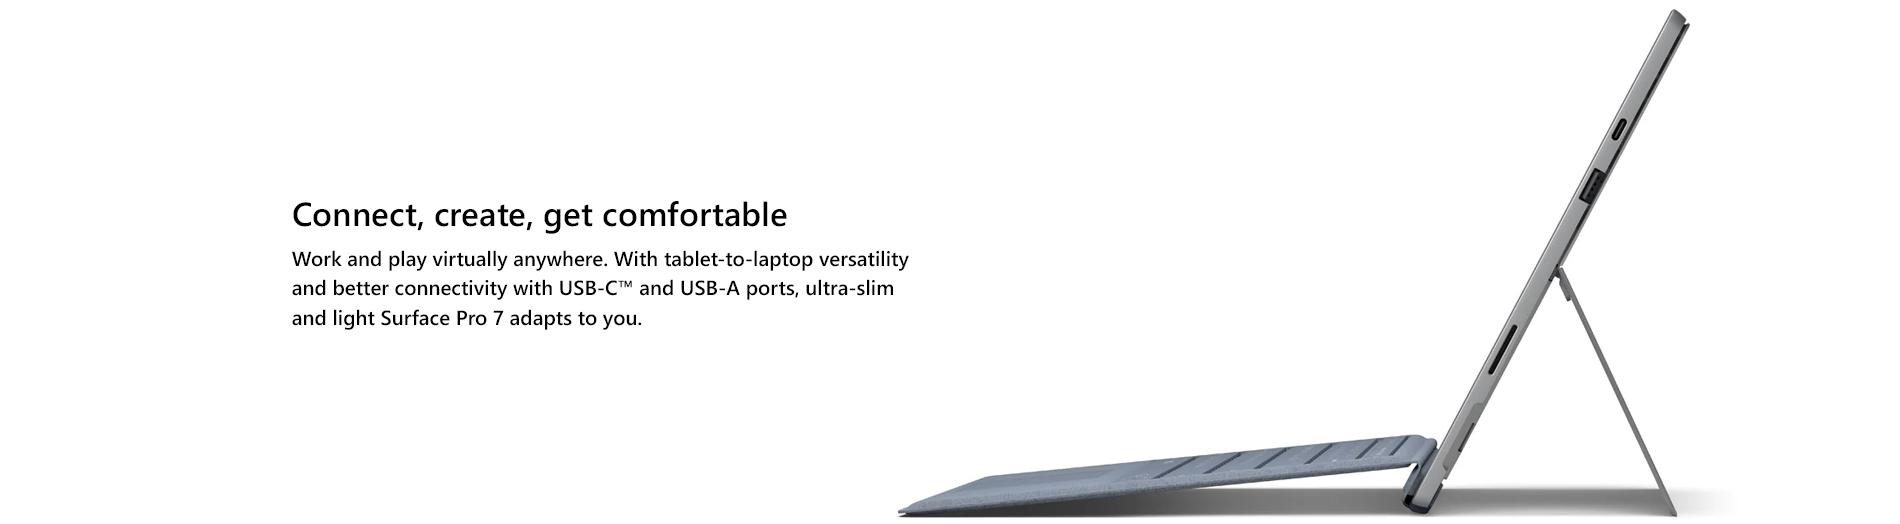 Microsoft Surface Pro7 General Landing Page  Tile 02